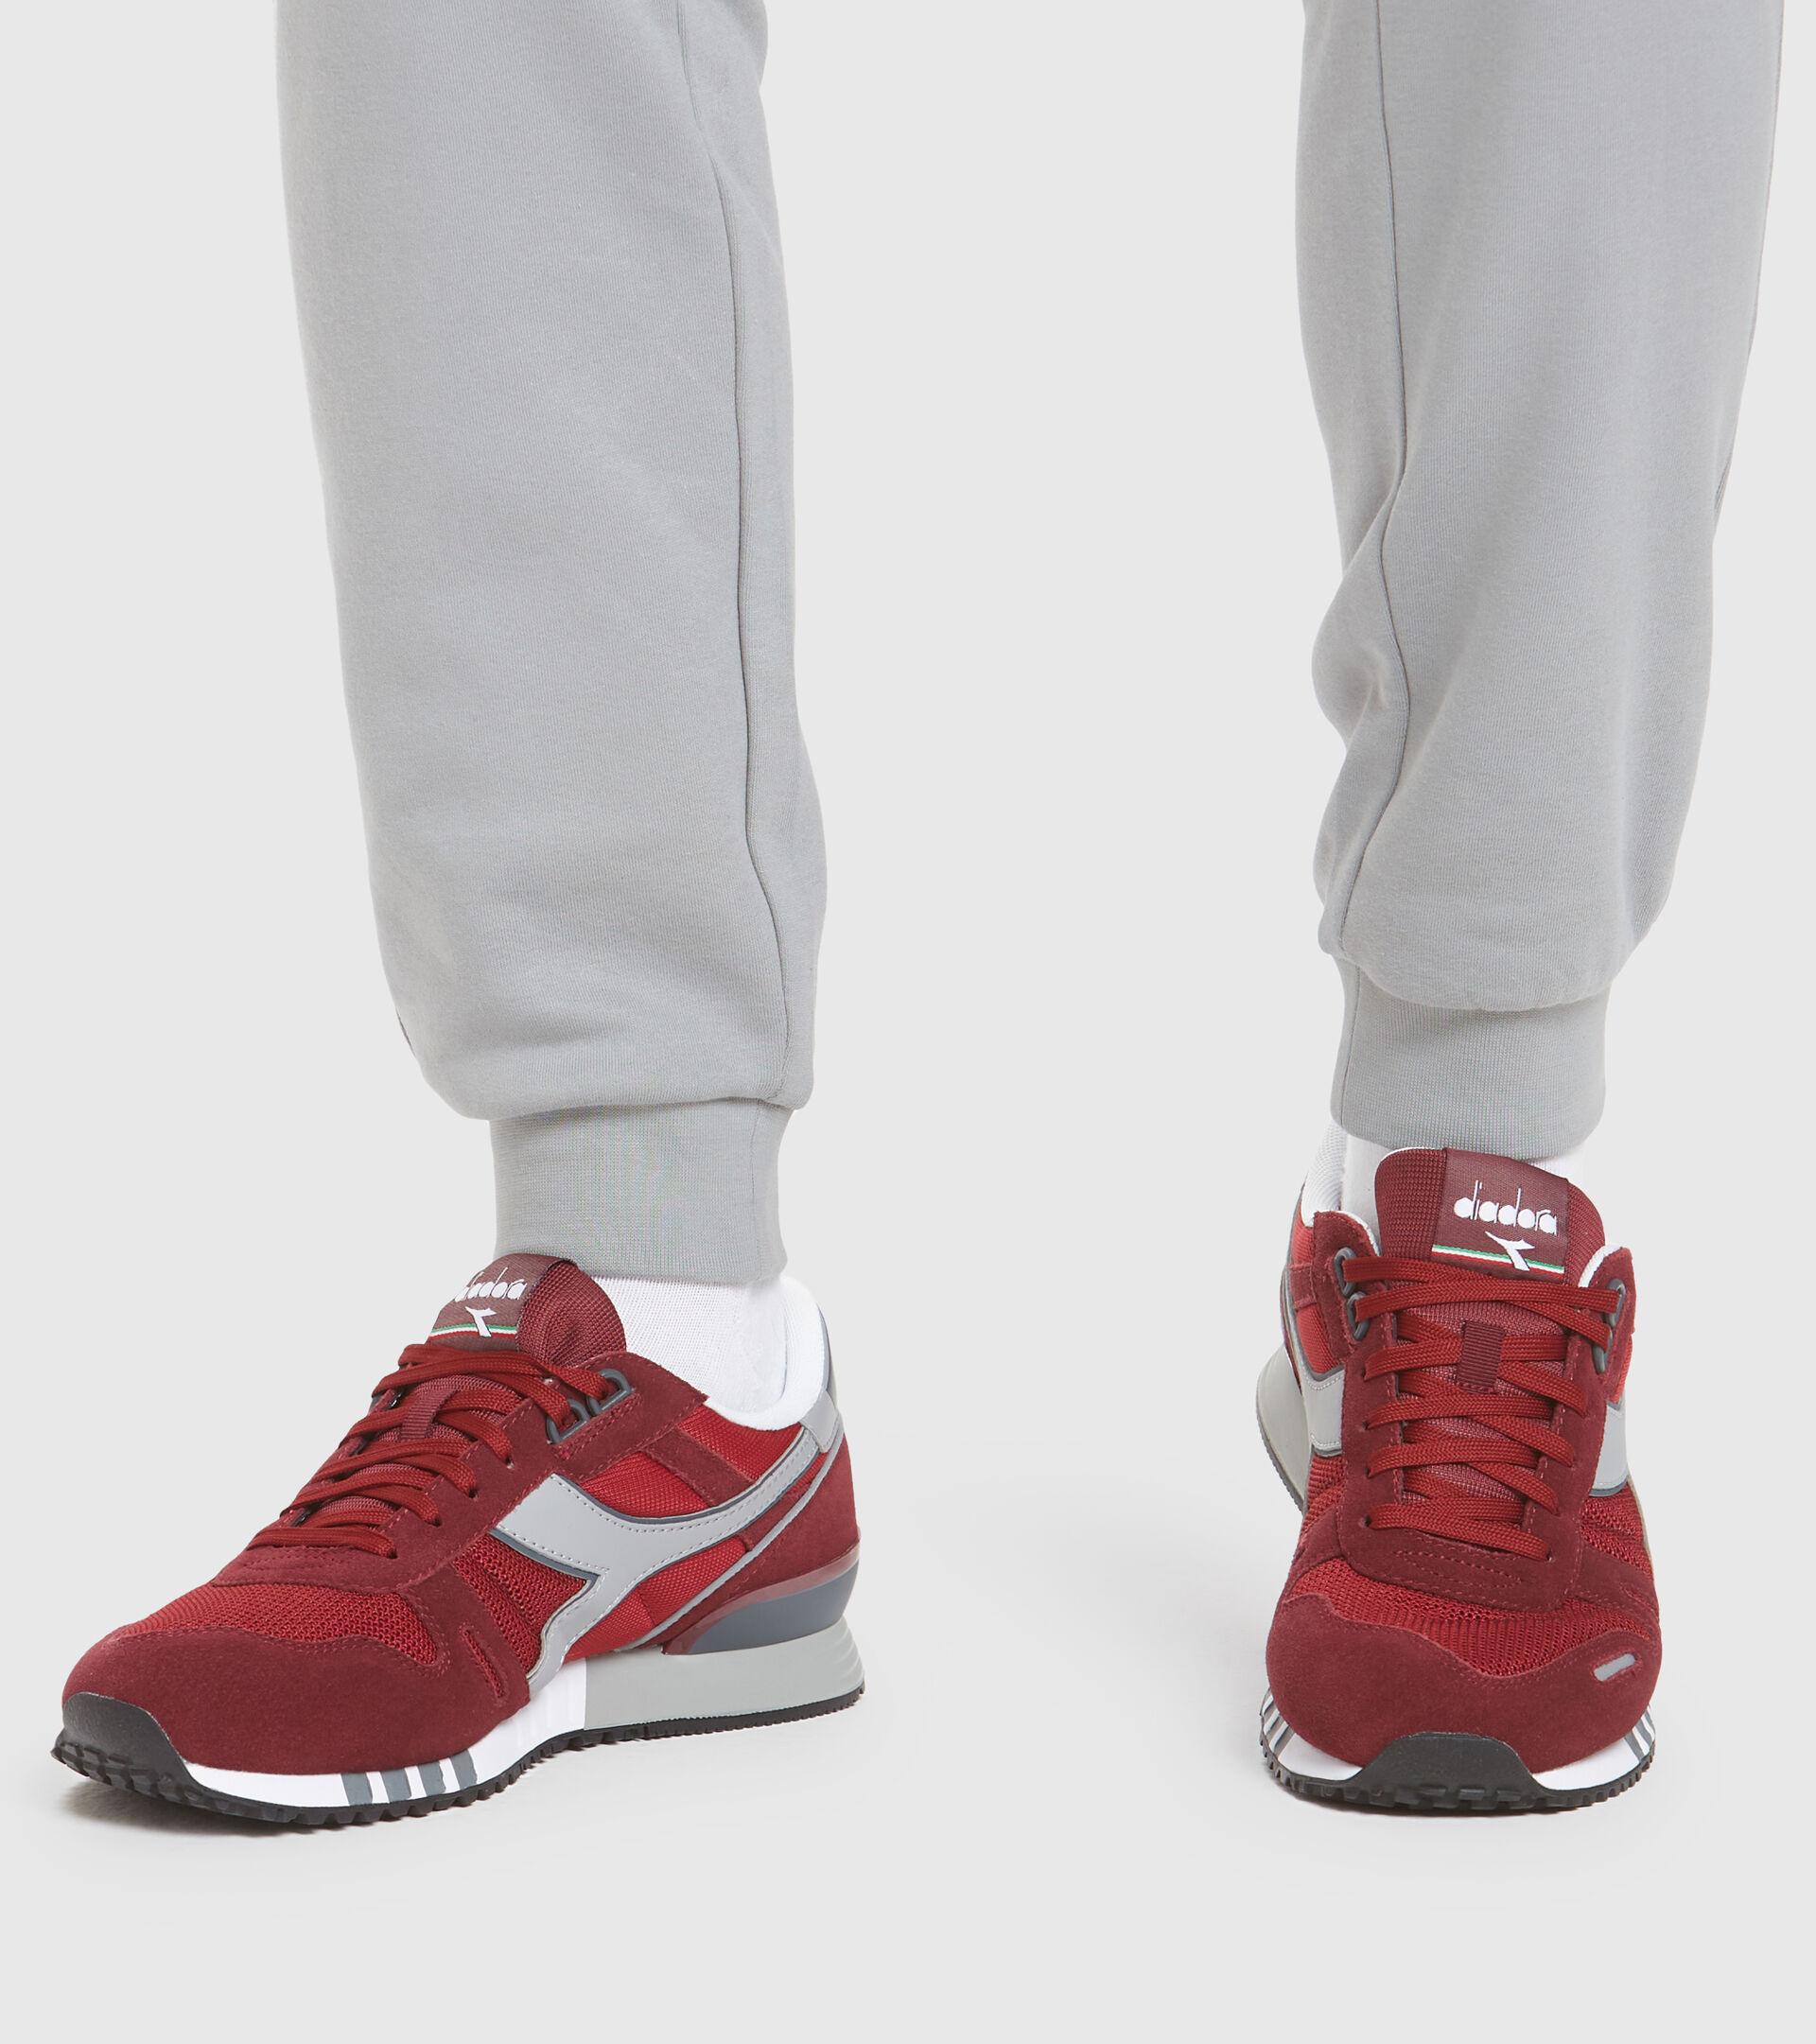 Footwear Sportswear UOMO TITAN VIOLET PRUNE (55017) Diadora